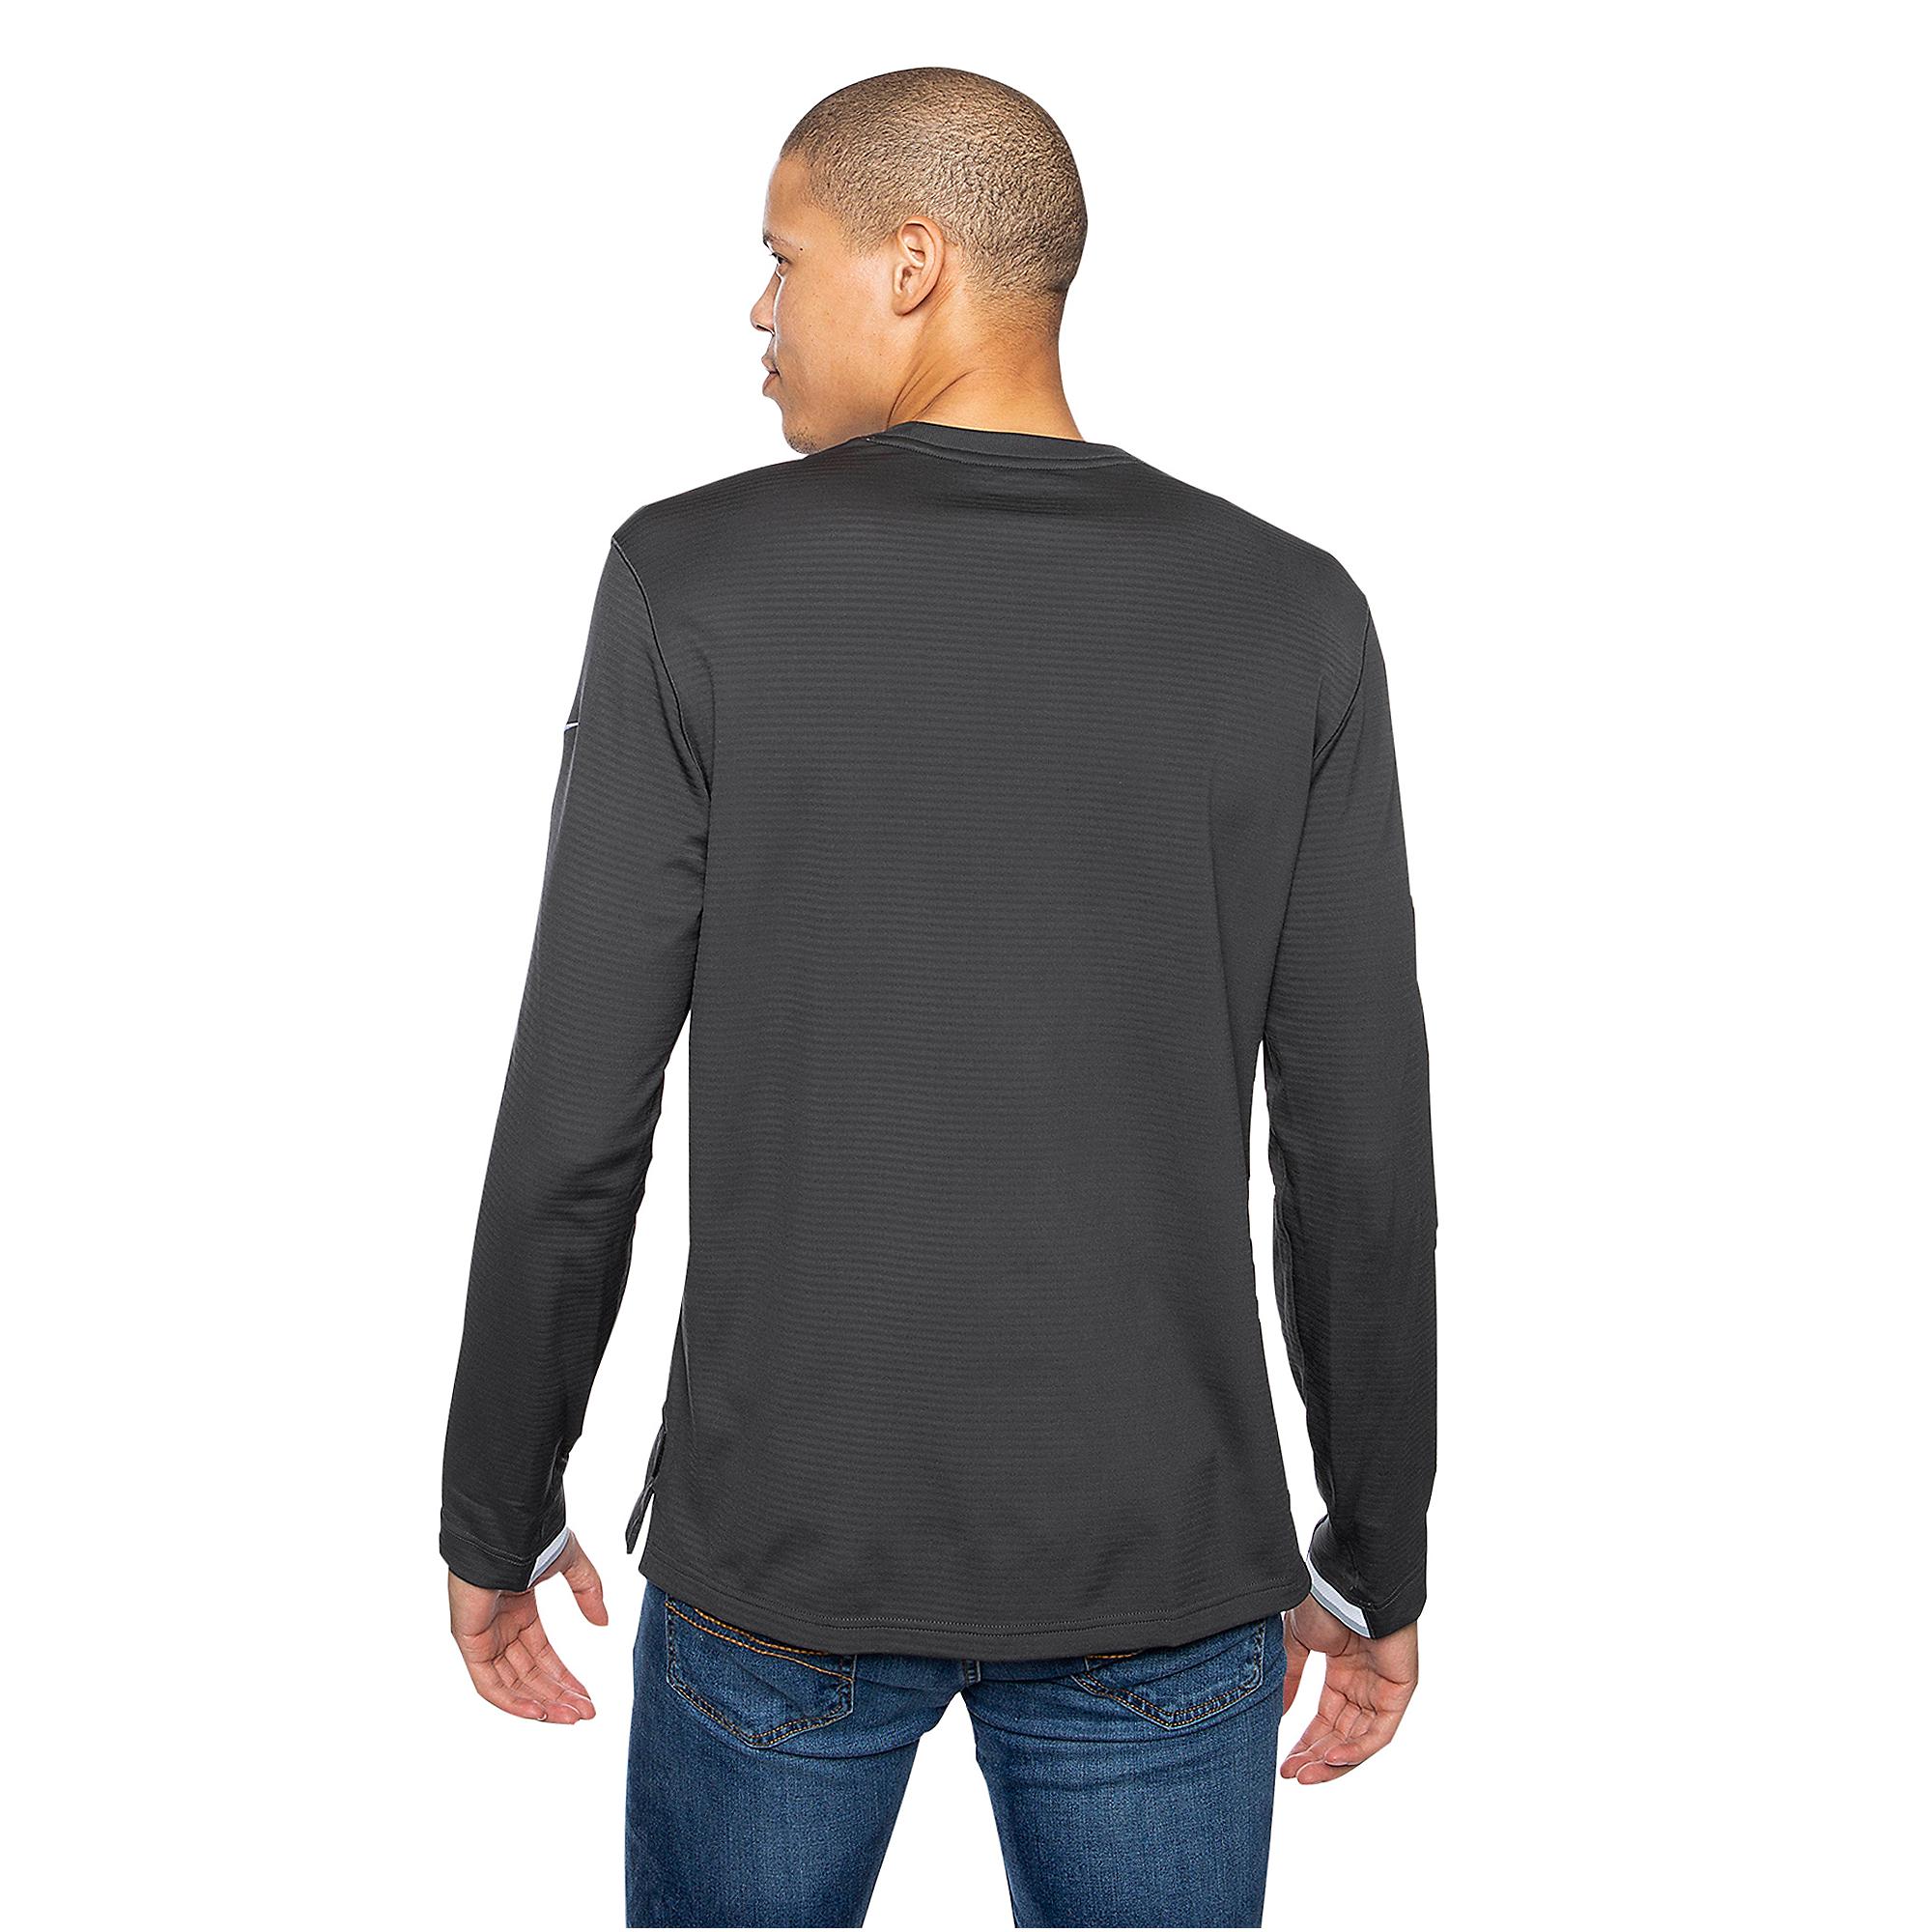 new style 0ff89 15871 Dallas Cowboys Mens Nike Dry Crew Sweatshirt | Dallas ...